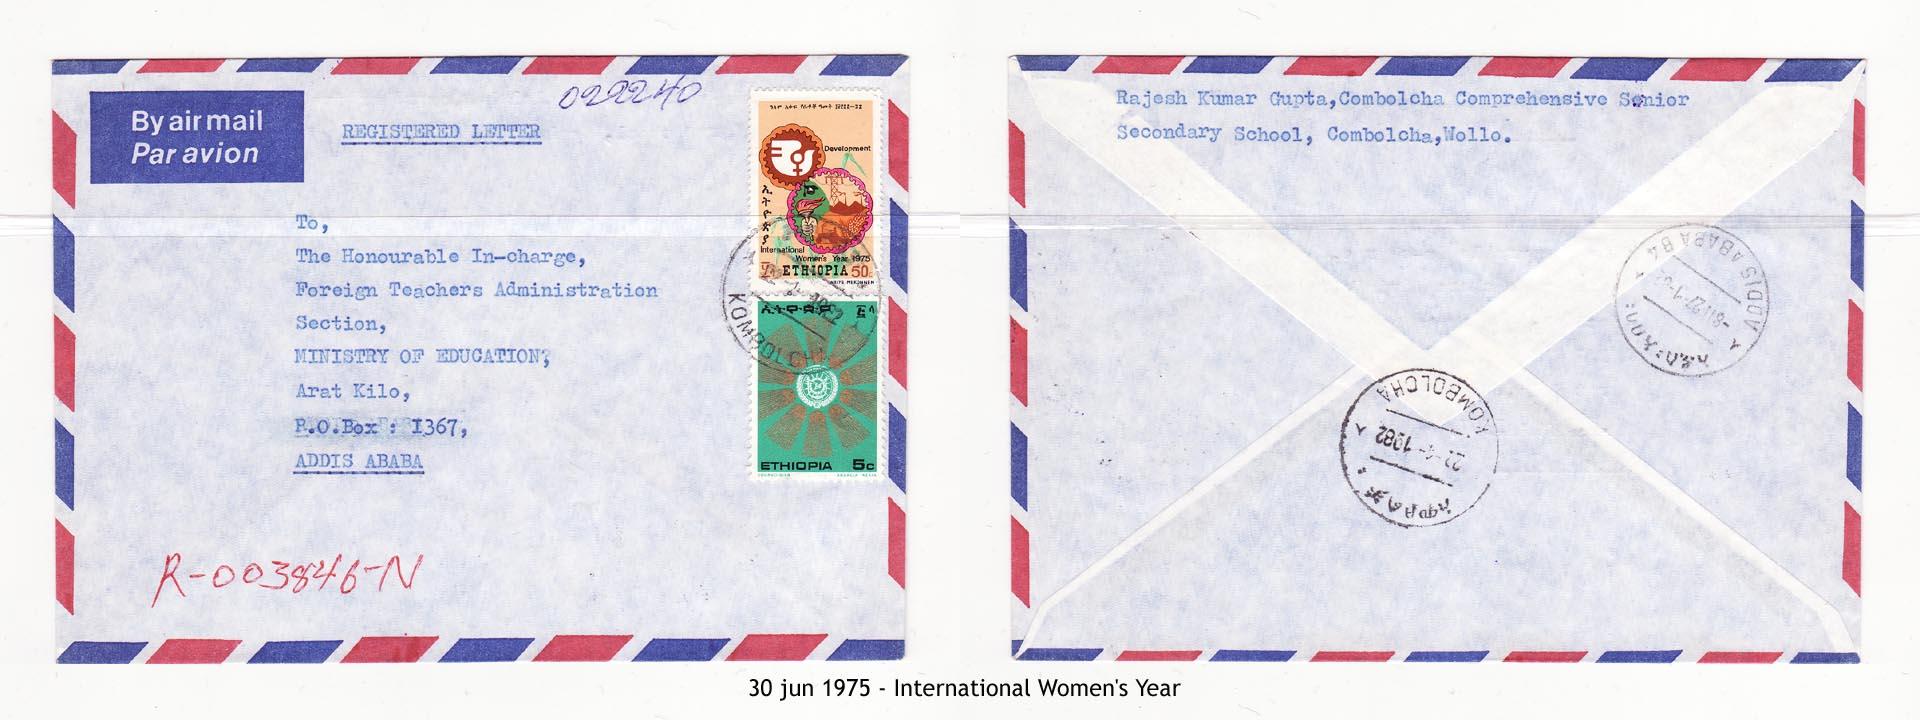 19750630 - International Women's Year